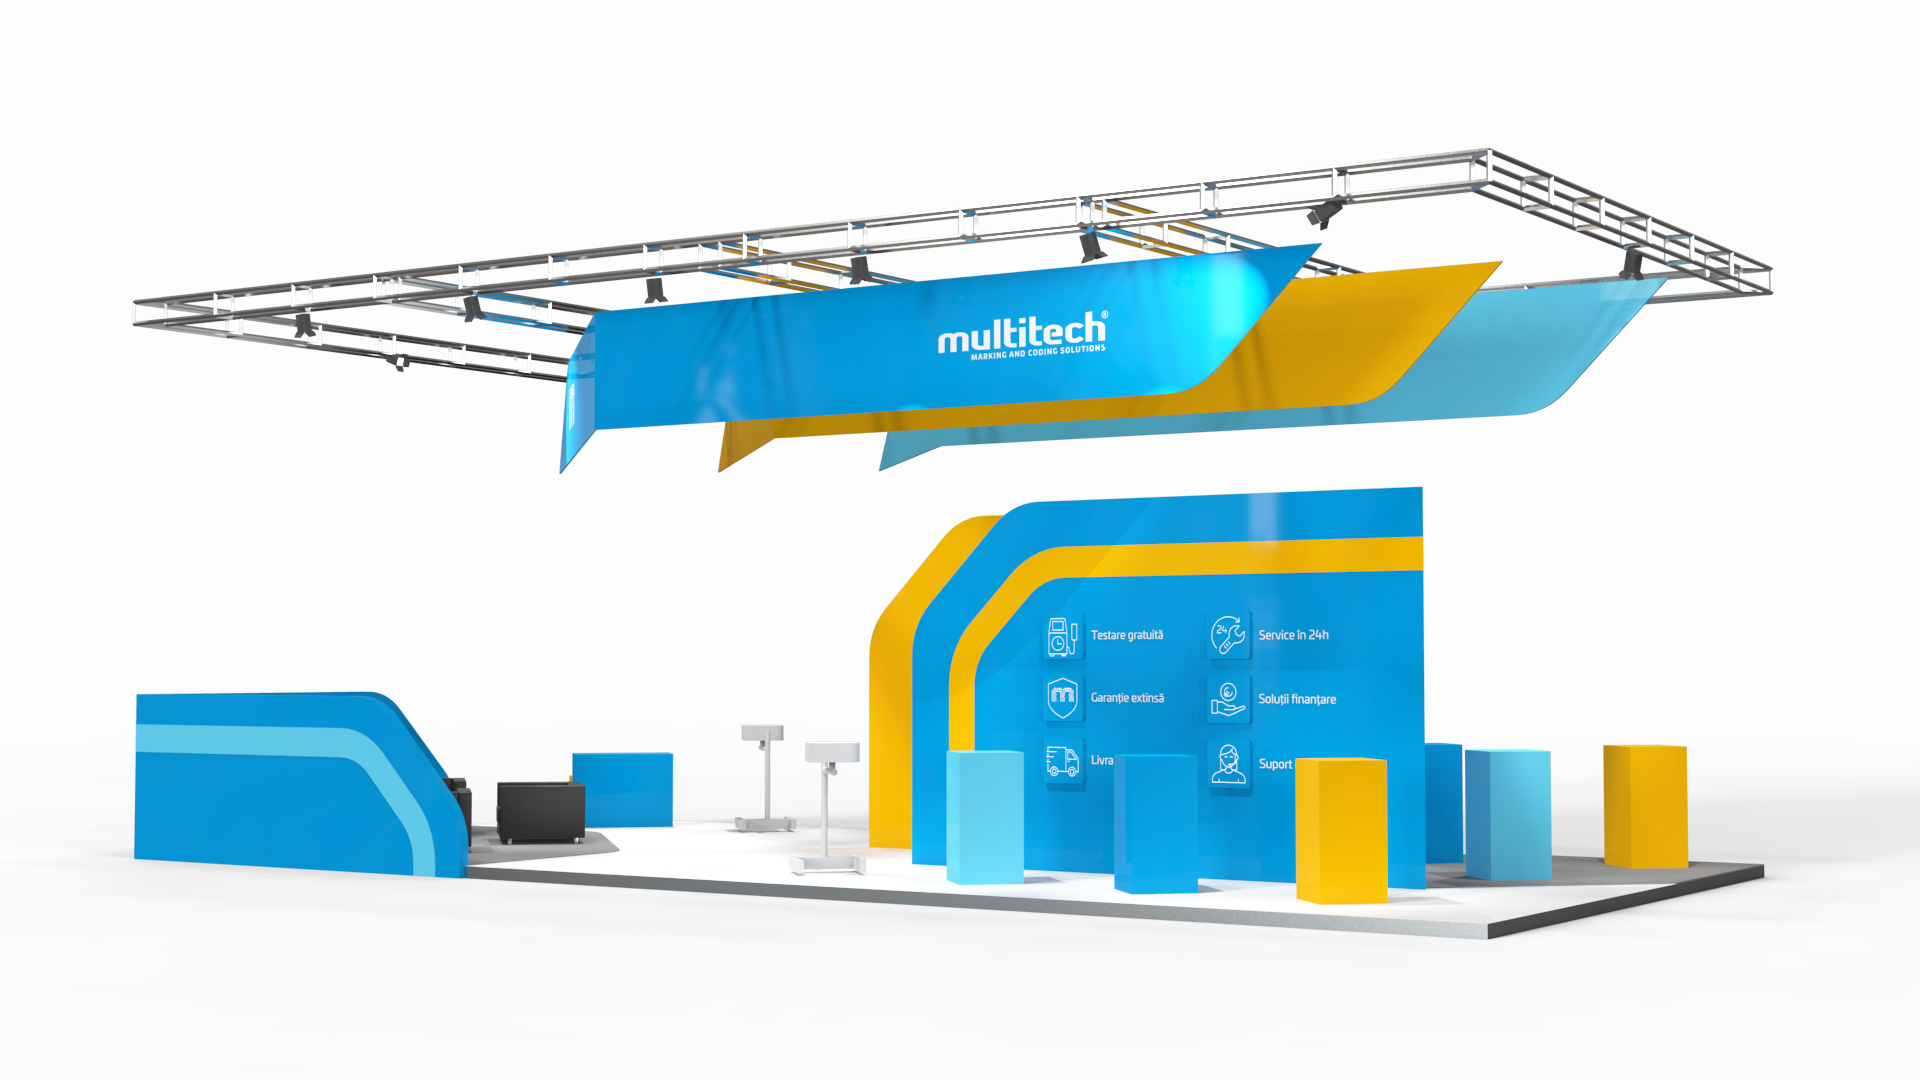 Bisigned-Multitech-Visual-Identity-Booth-Design_4.jpg